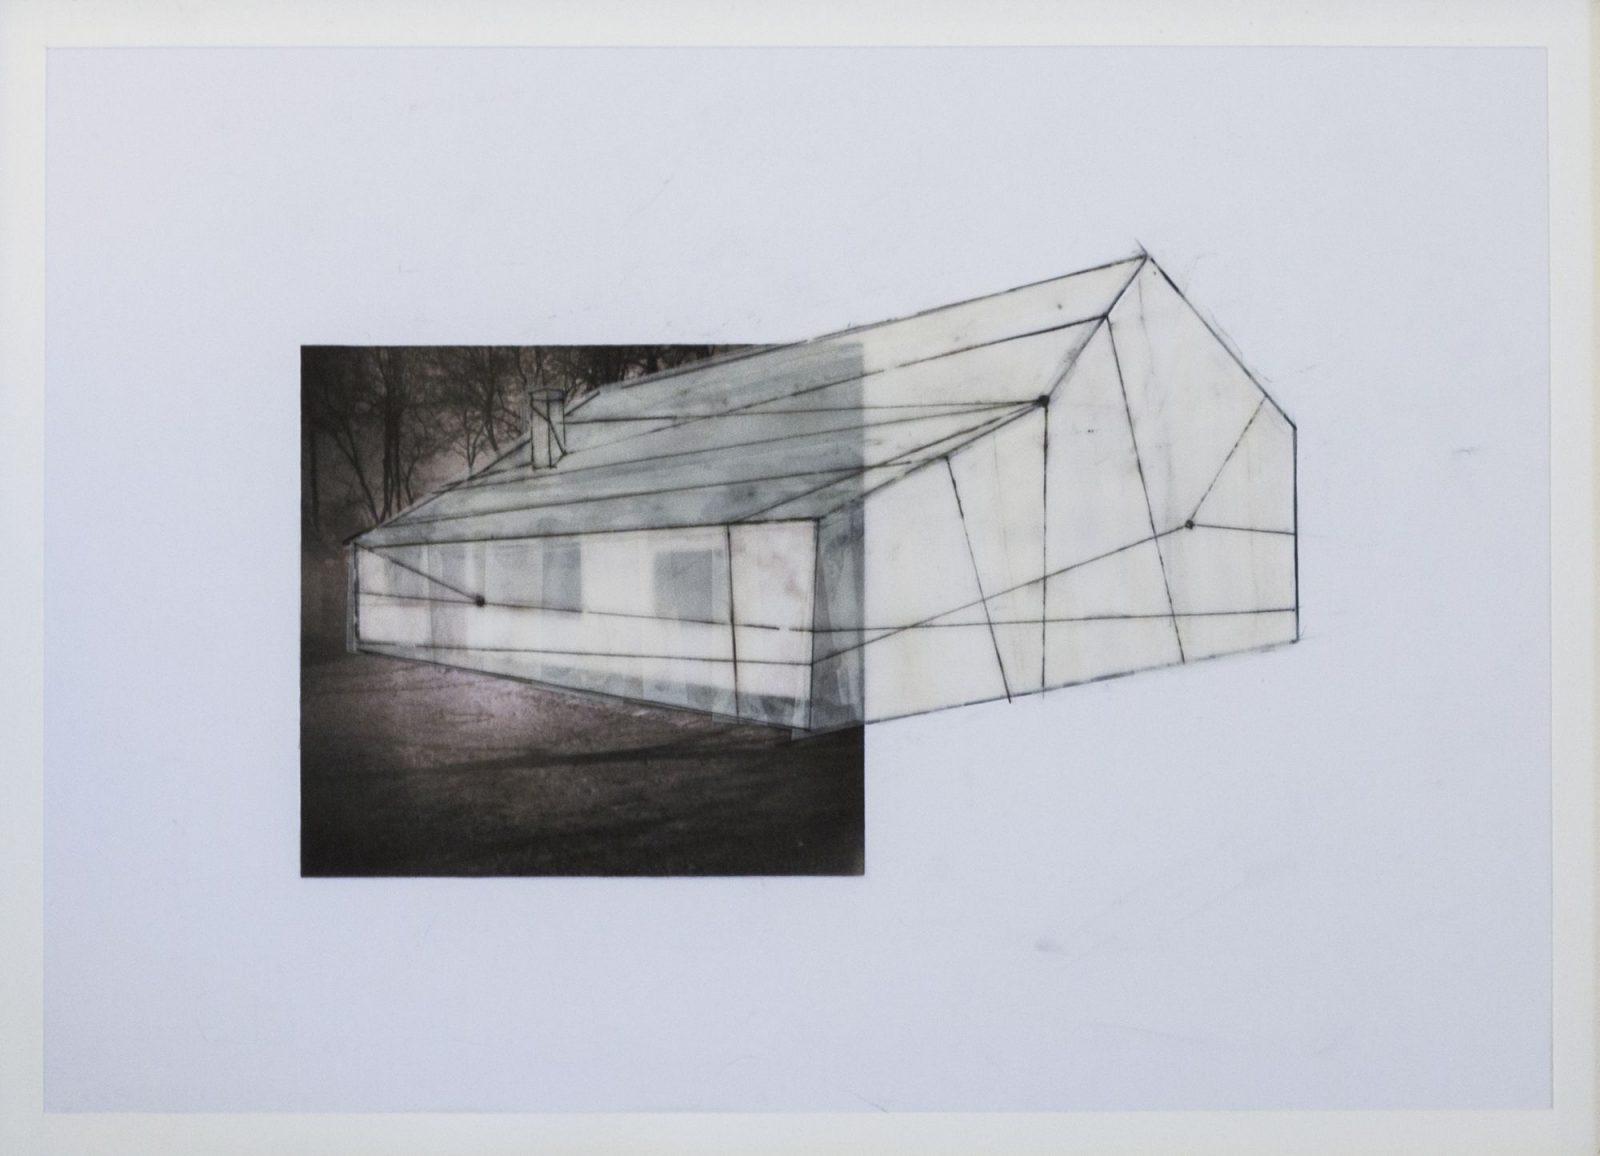 Roland Kazi: Packaging Design for Christo